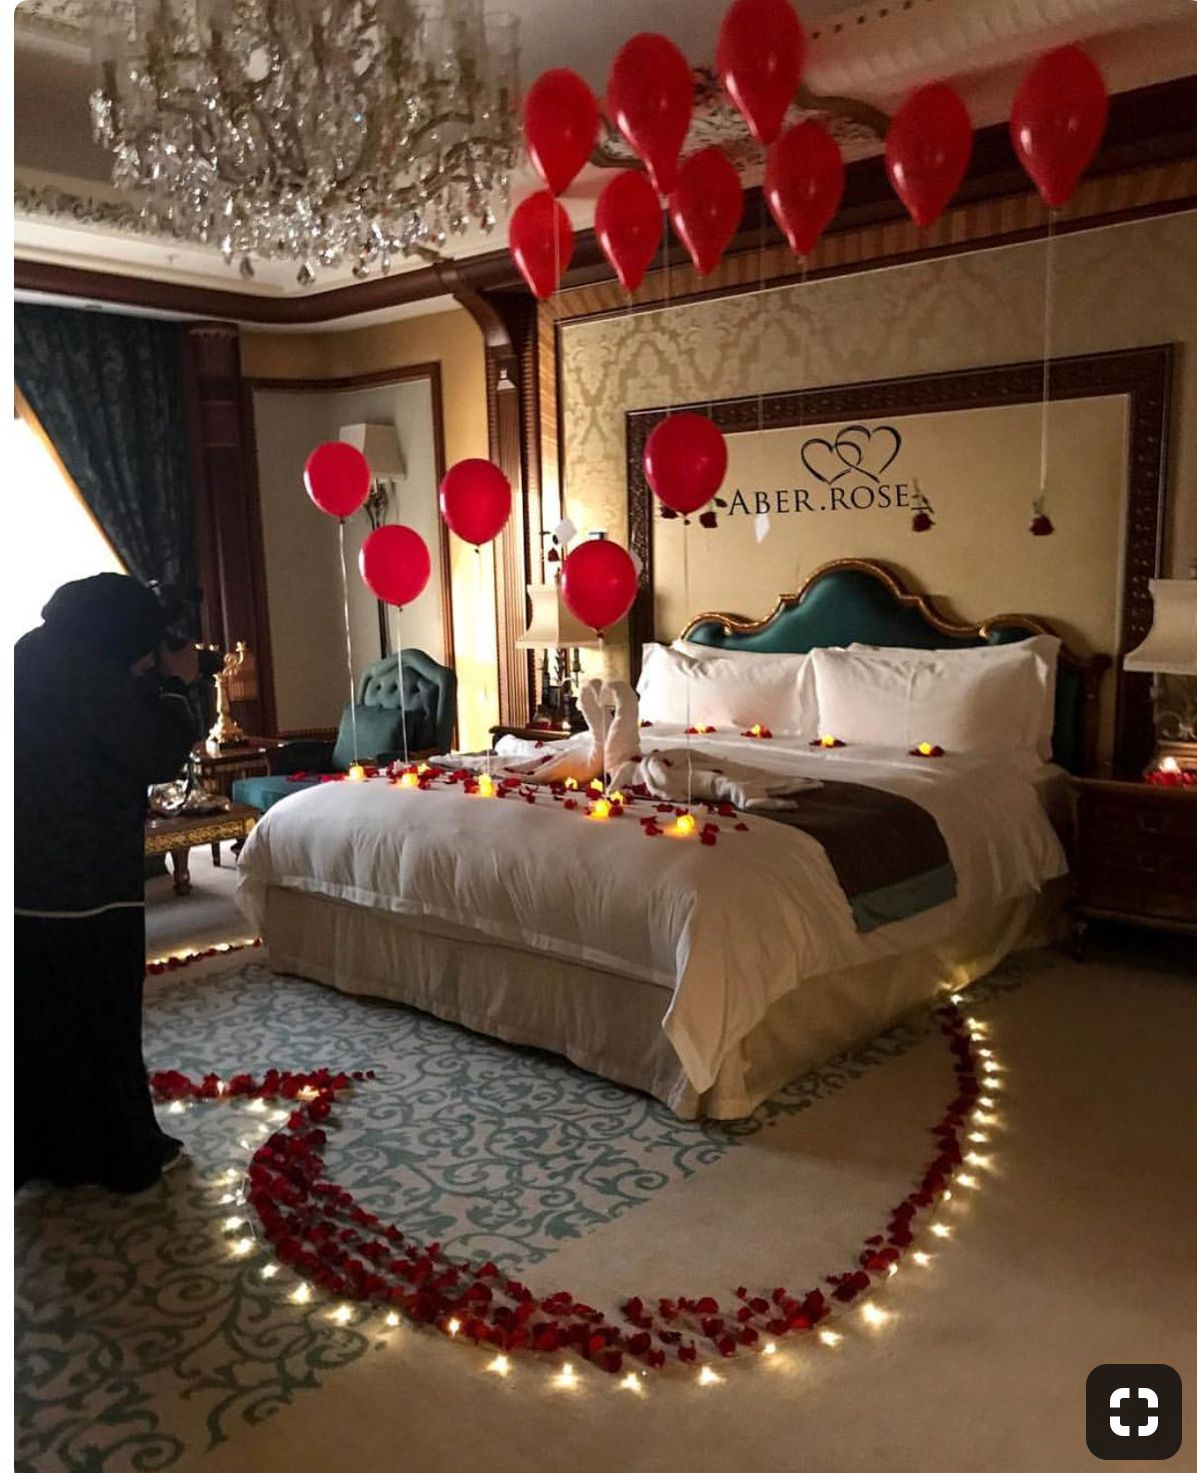 16/04/2021· top 10 romantic bedroom ideas for anniversary celebration valentine decor valentines. ROMANTIC ️ ️ ️ ️ ️ ️ | Romantic room surprise, Romantic